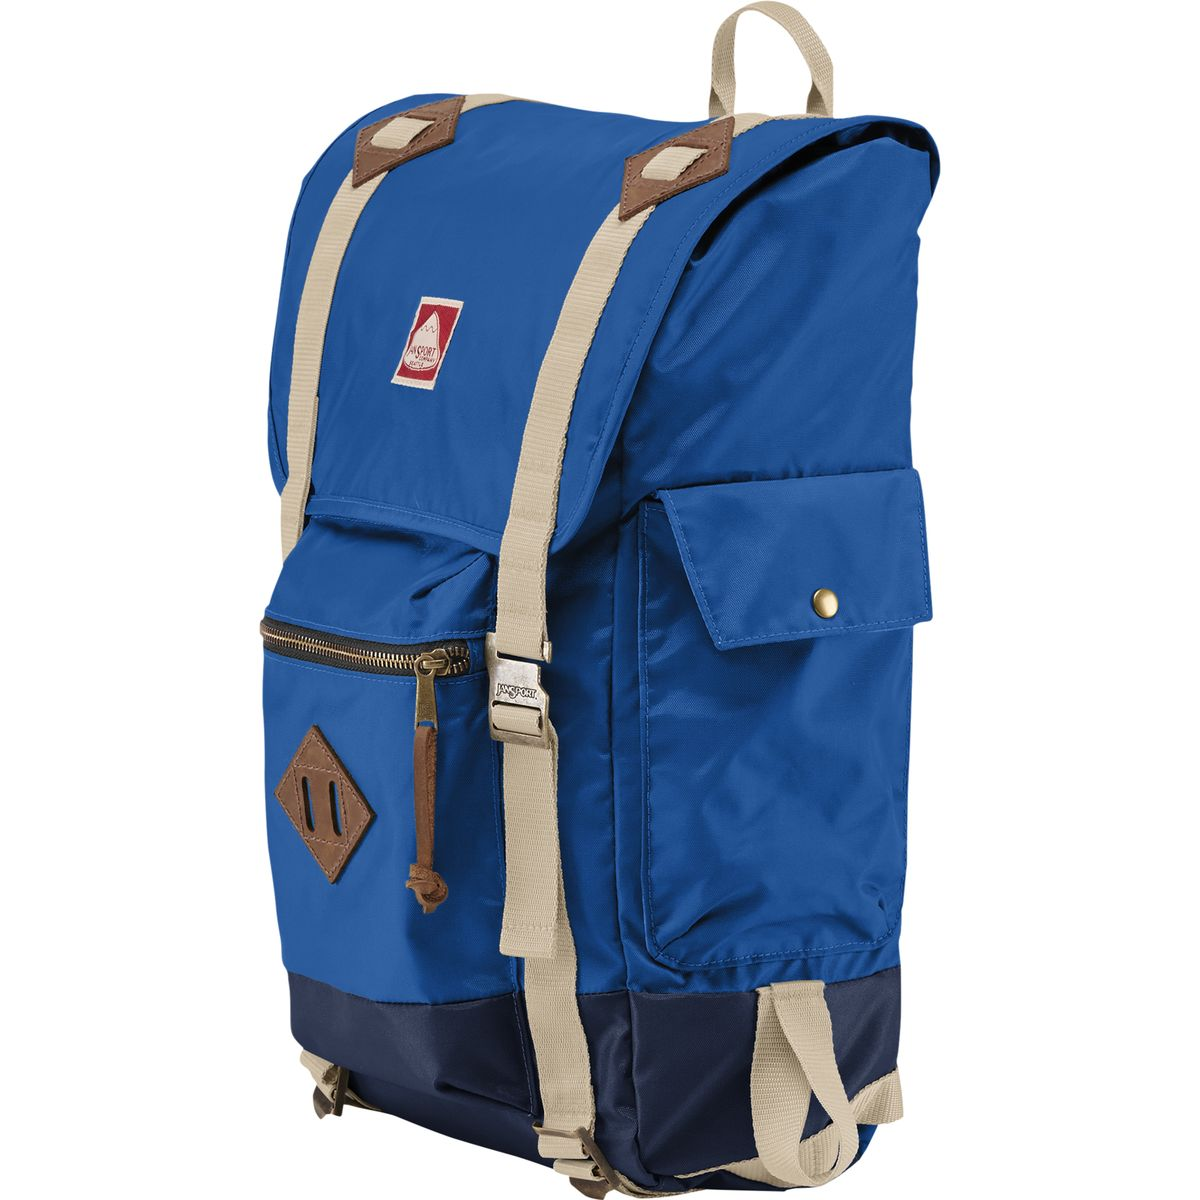 JanSport Adobe Backpack Blue Streak One Size